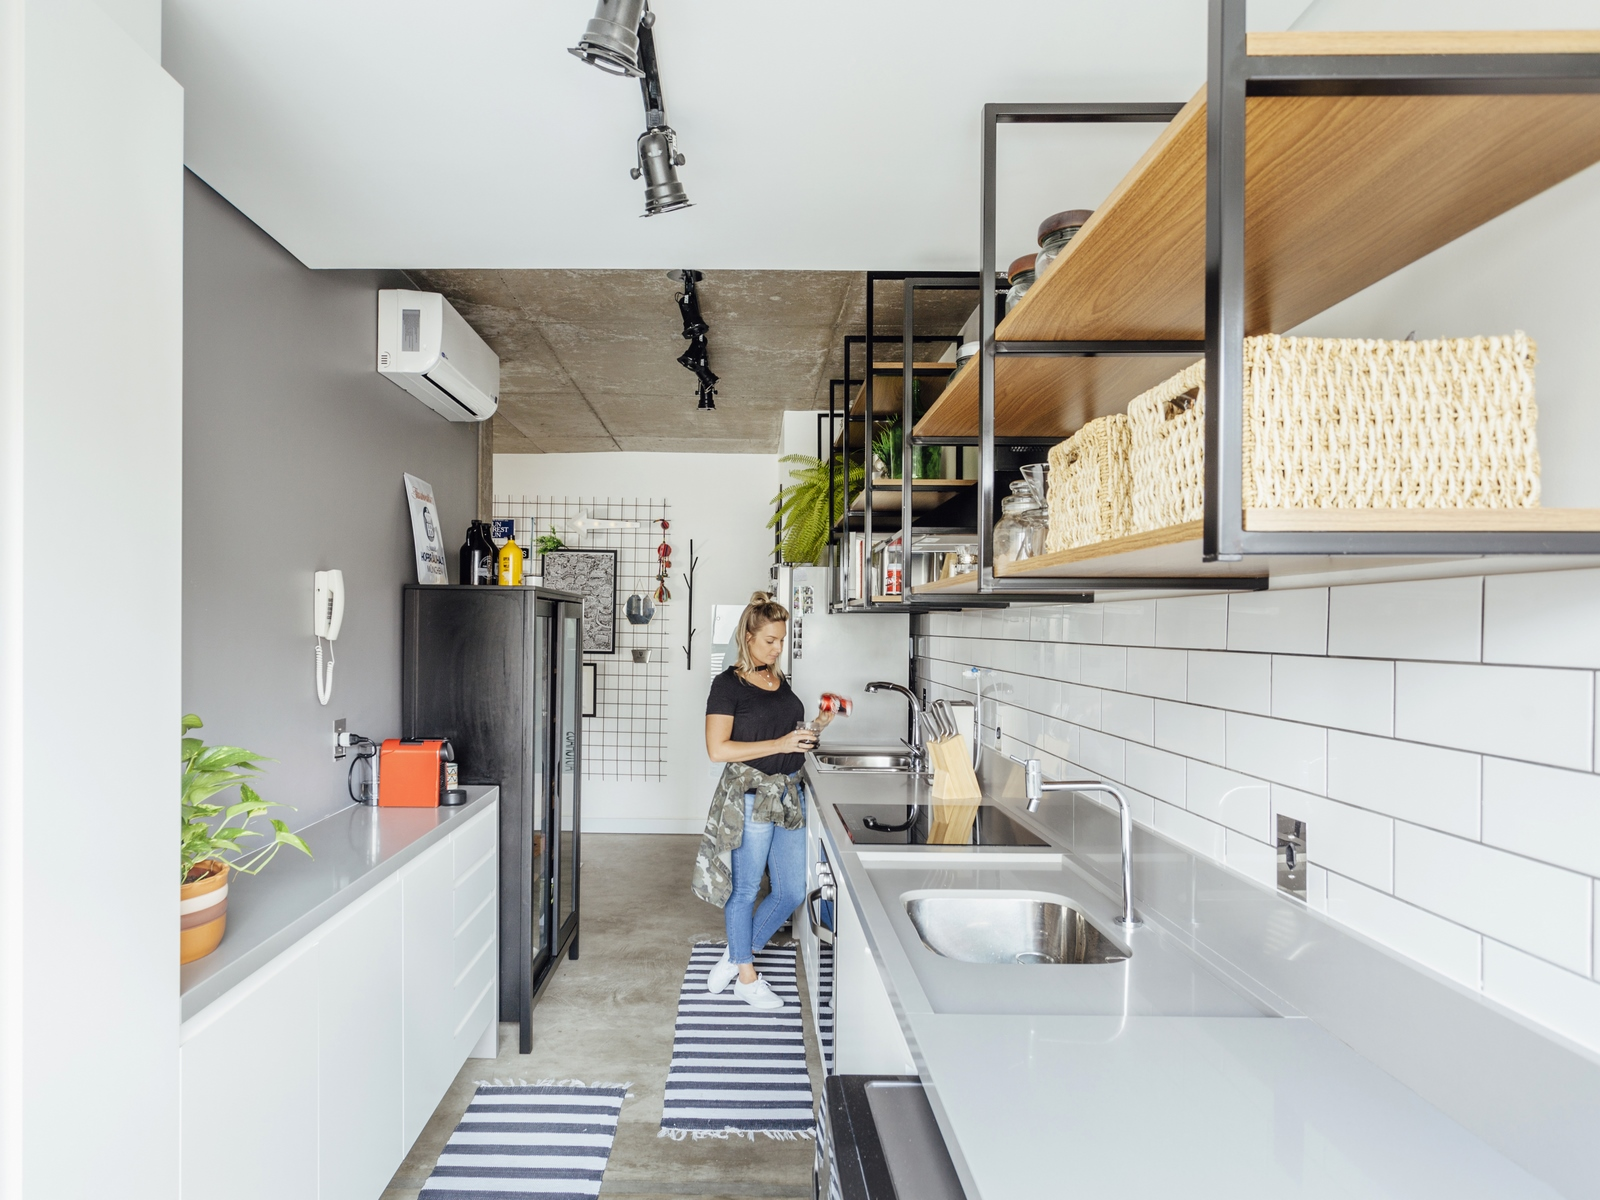 Apartamento Maxhaus -24 (Copiar)